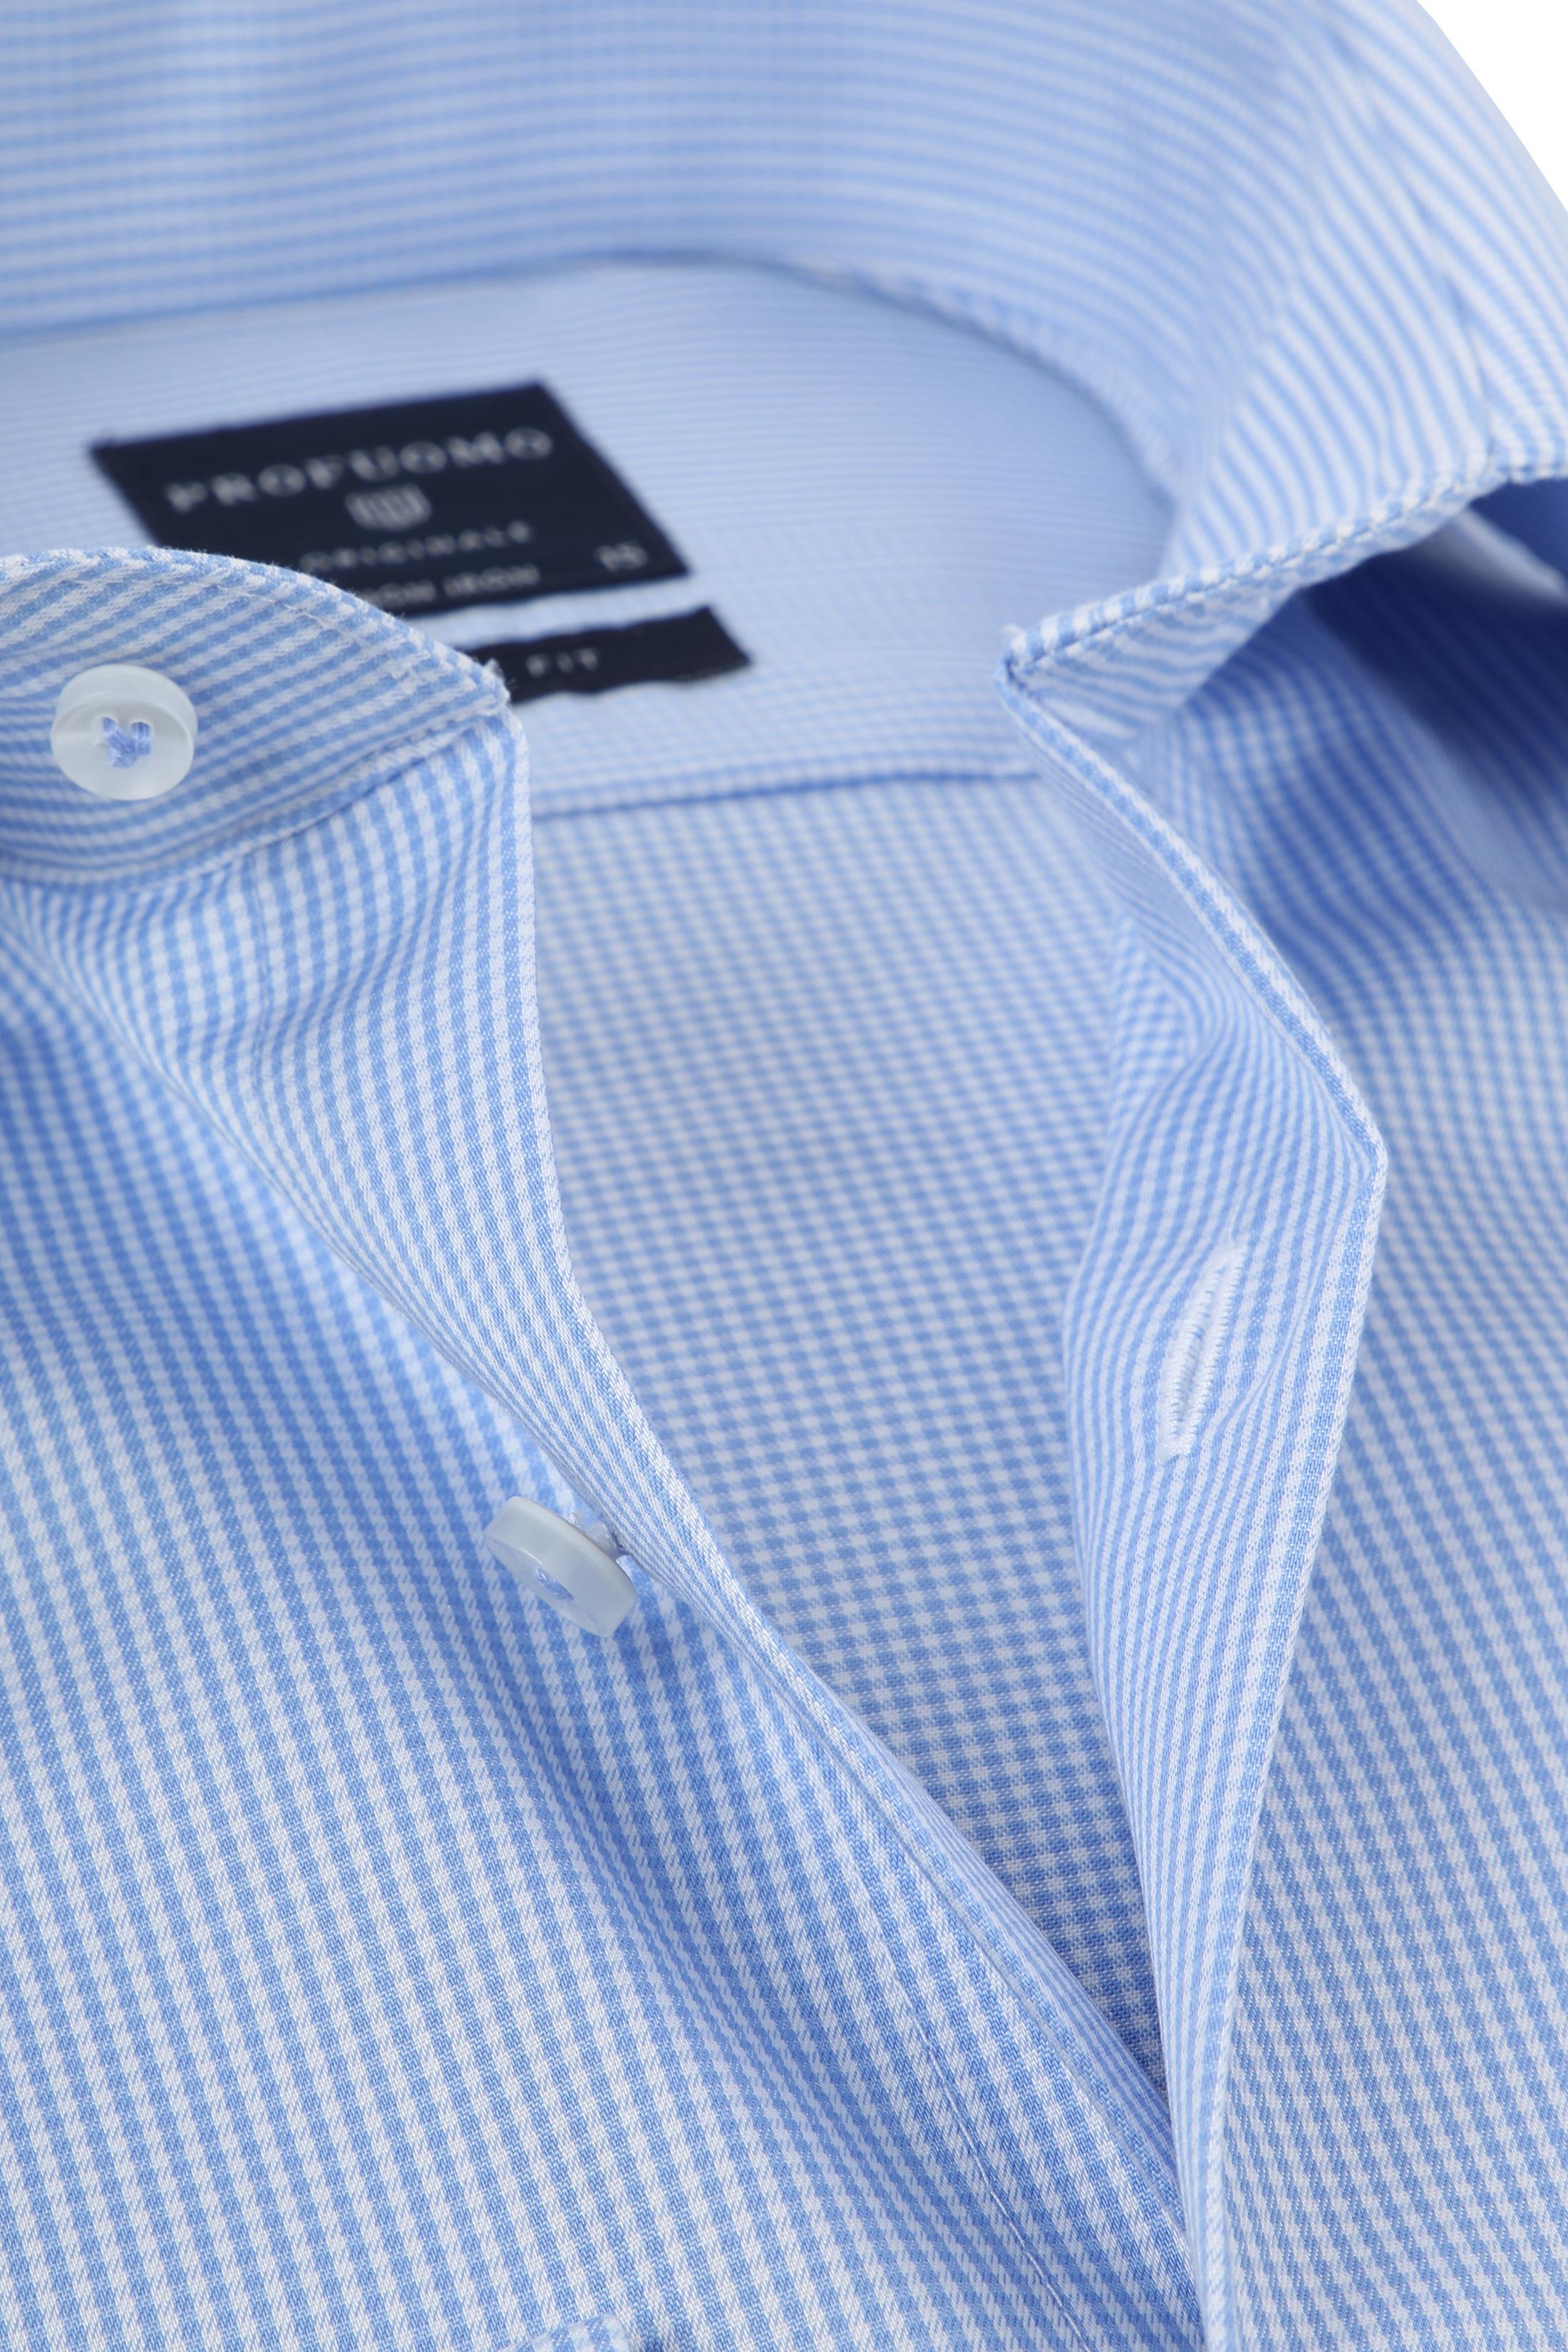 Profuomo Overhemd Cutaway Blauw Ruit foto 1